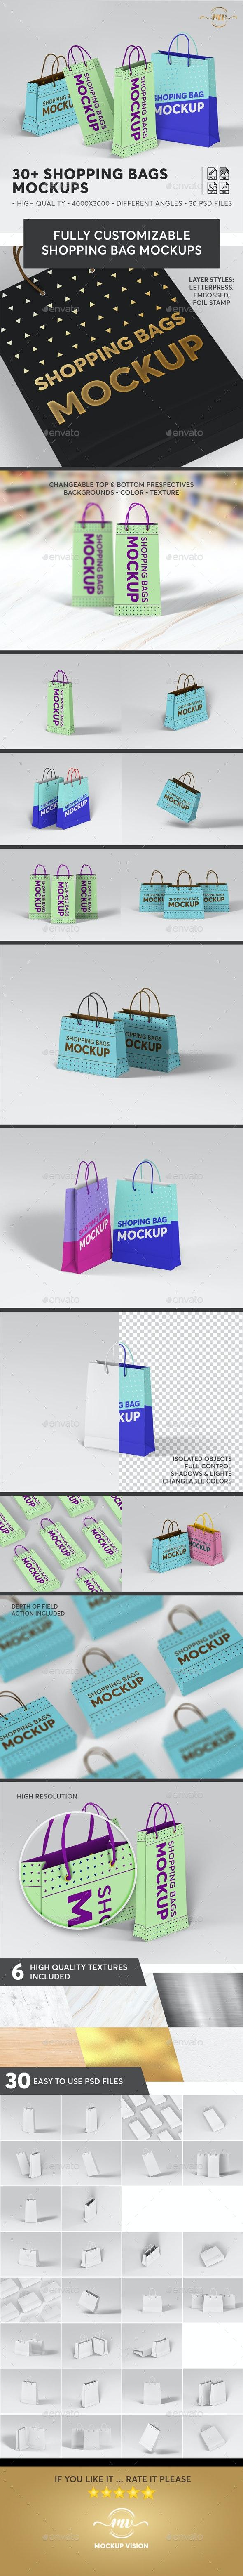 30+ Shopping Bags Mockups Bundle - Miscellaneous Print